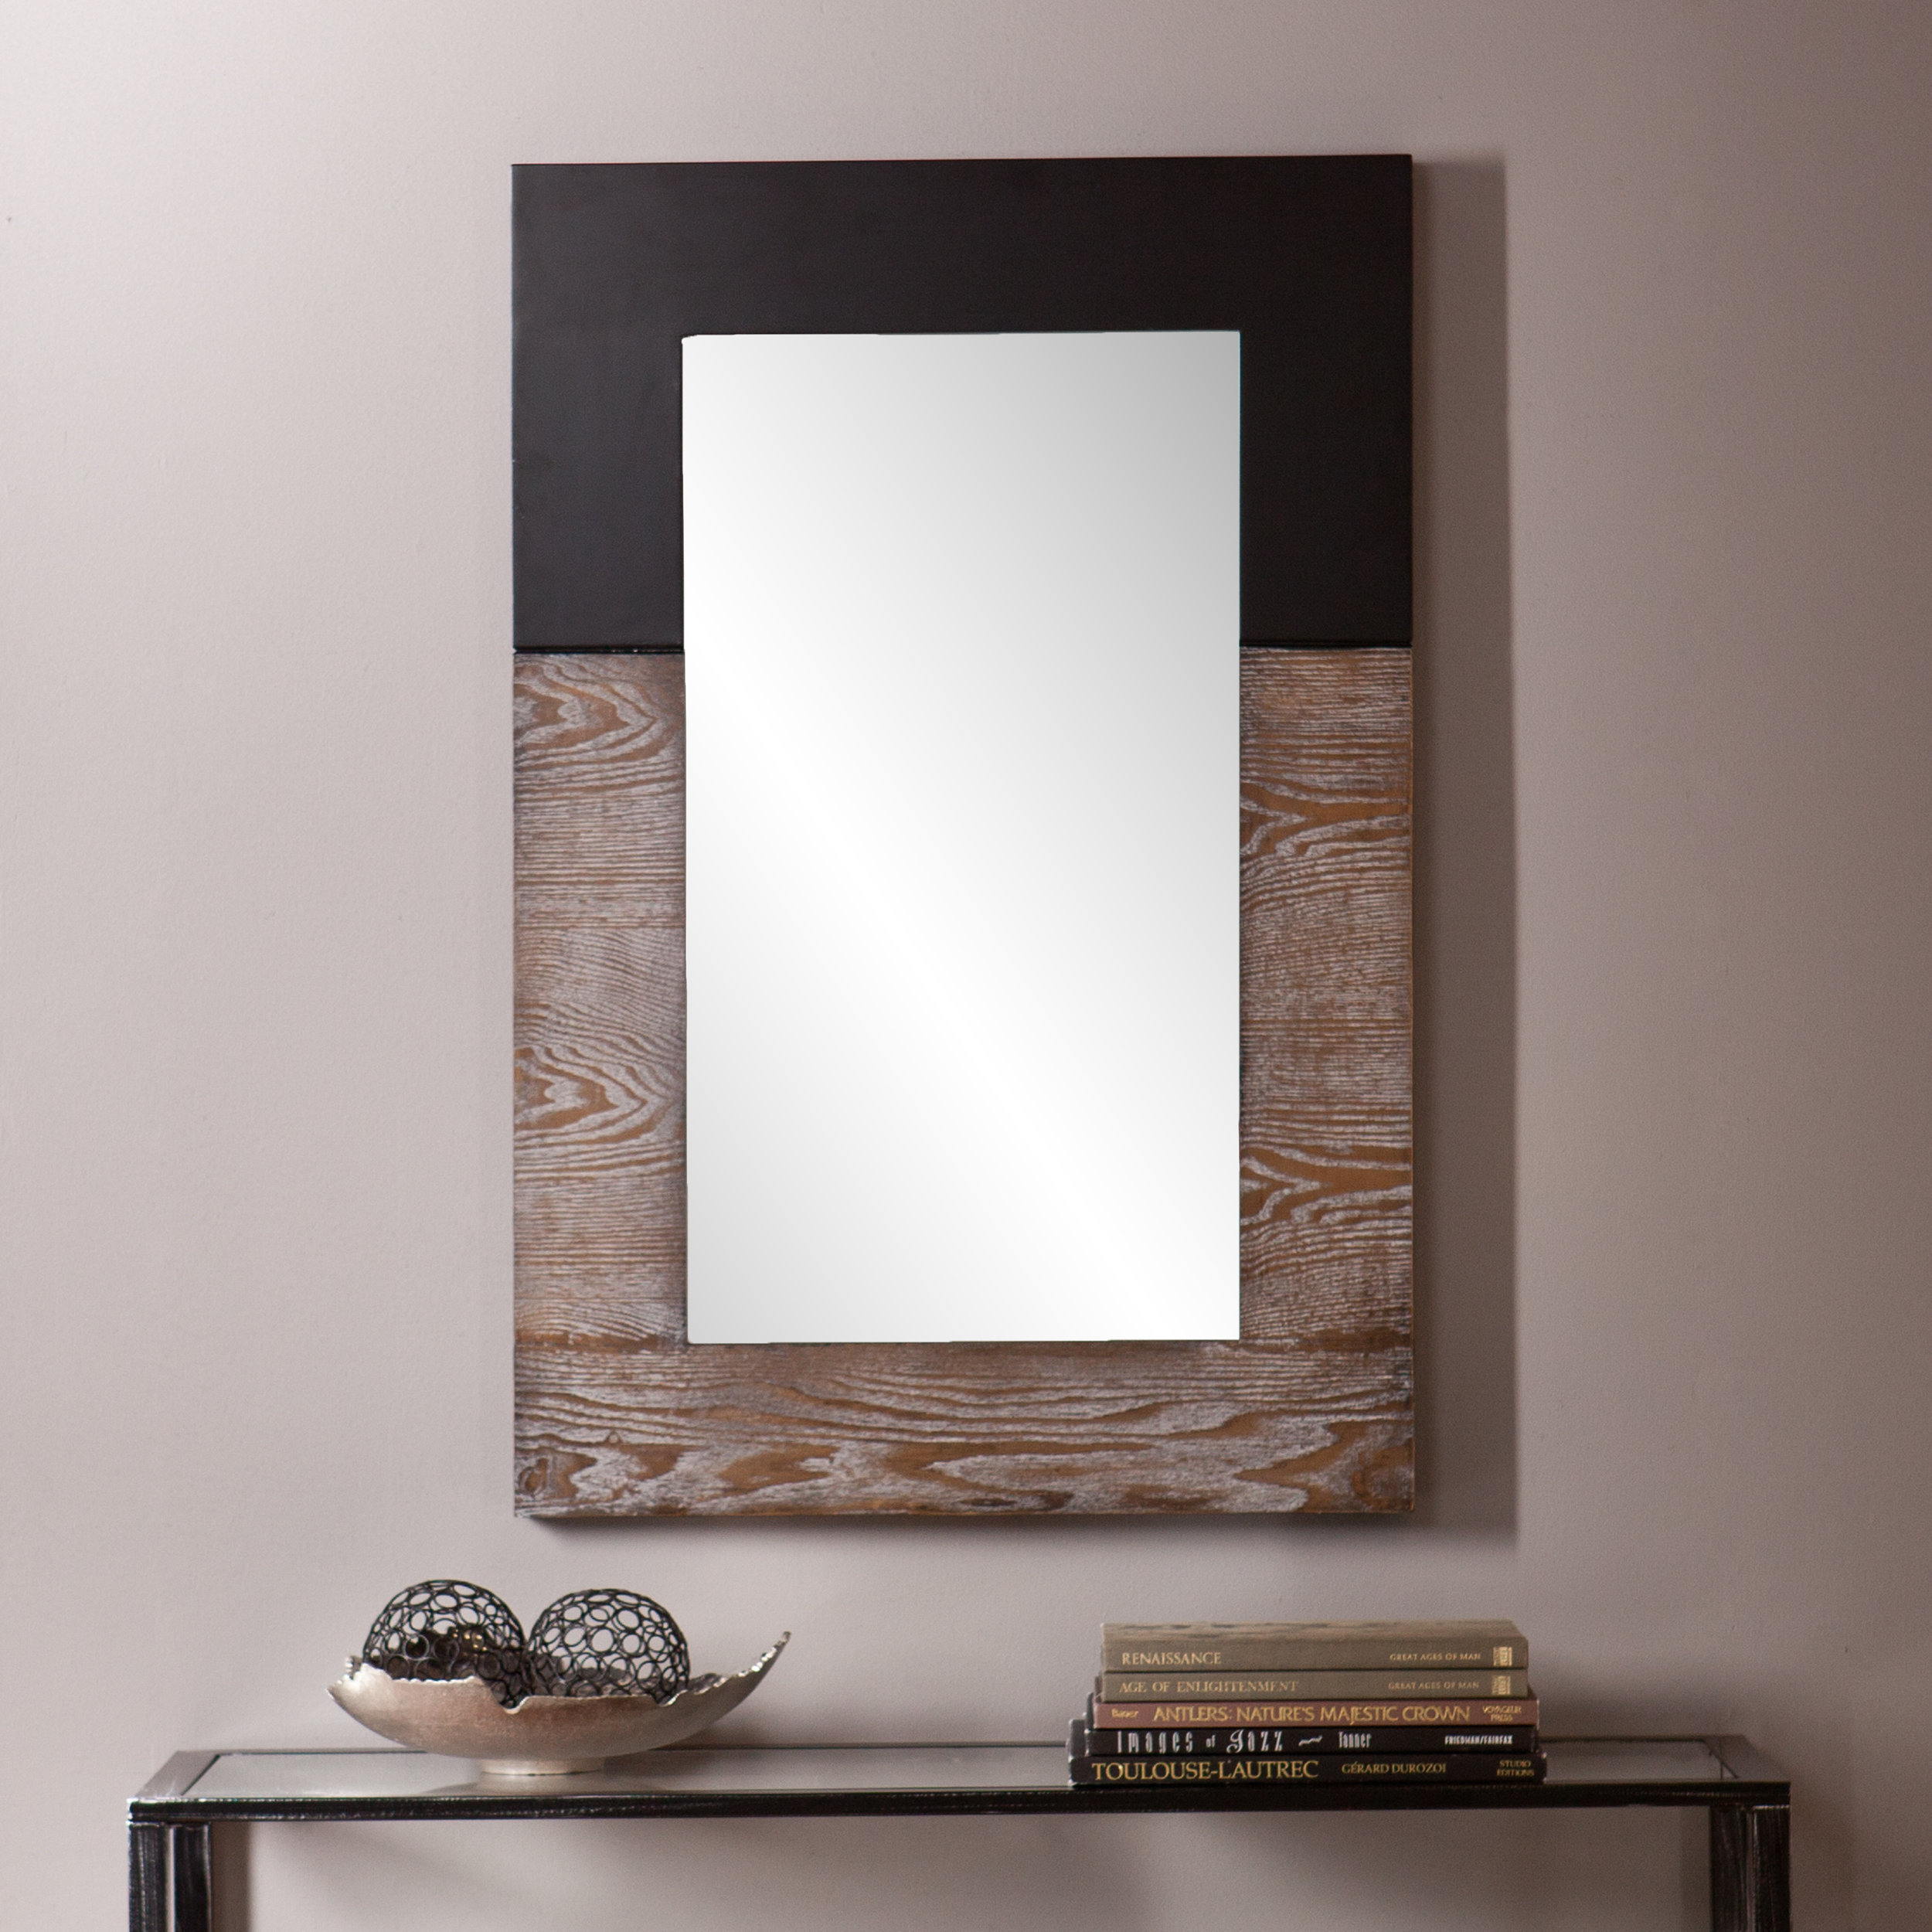 Farmhouse & Rustic Trent Austin Design Wall & Accent Mirrors Regarding Maude Accent Mirrors (Image 5 of 20)